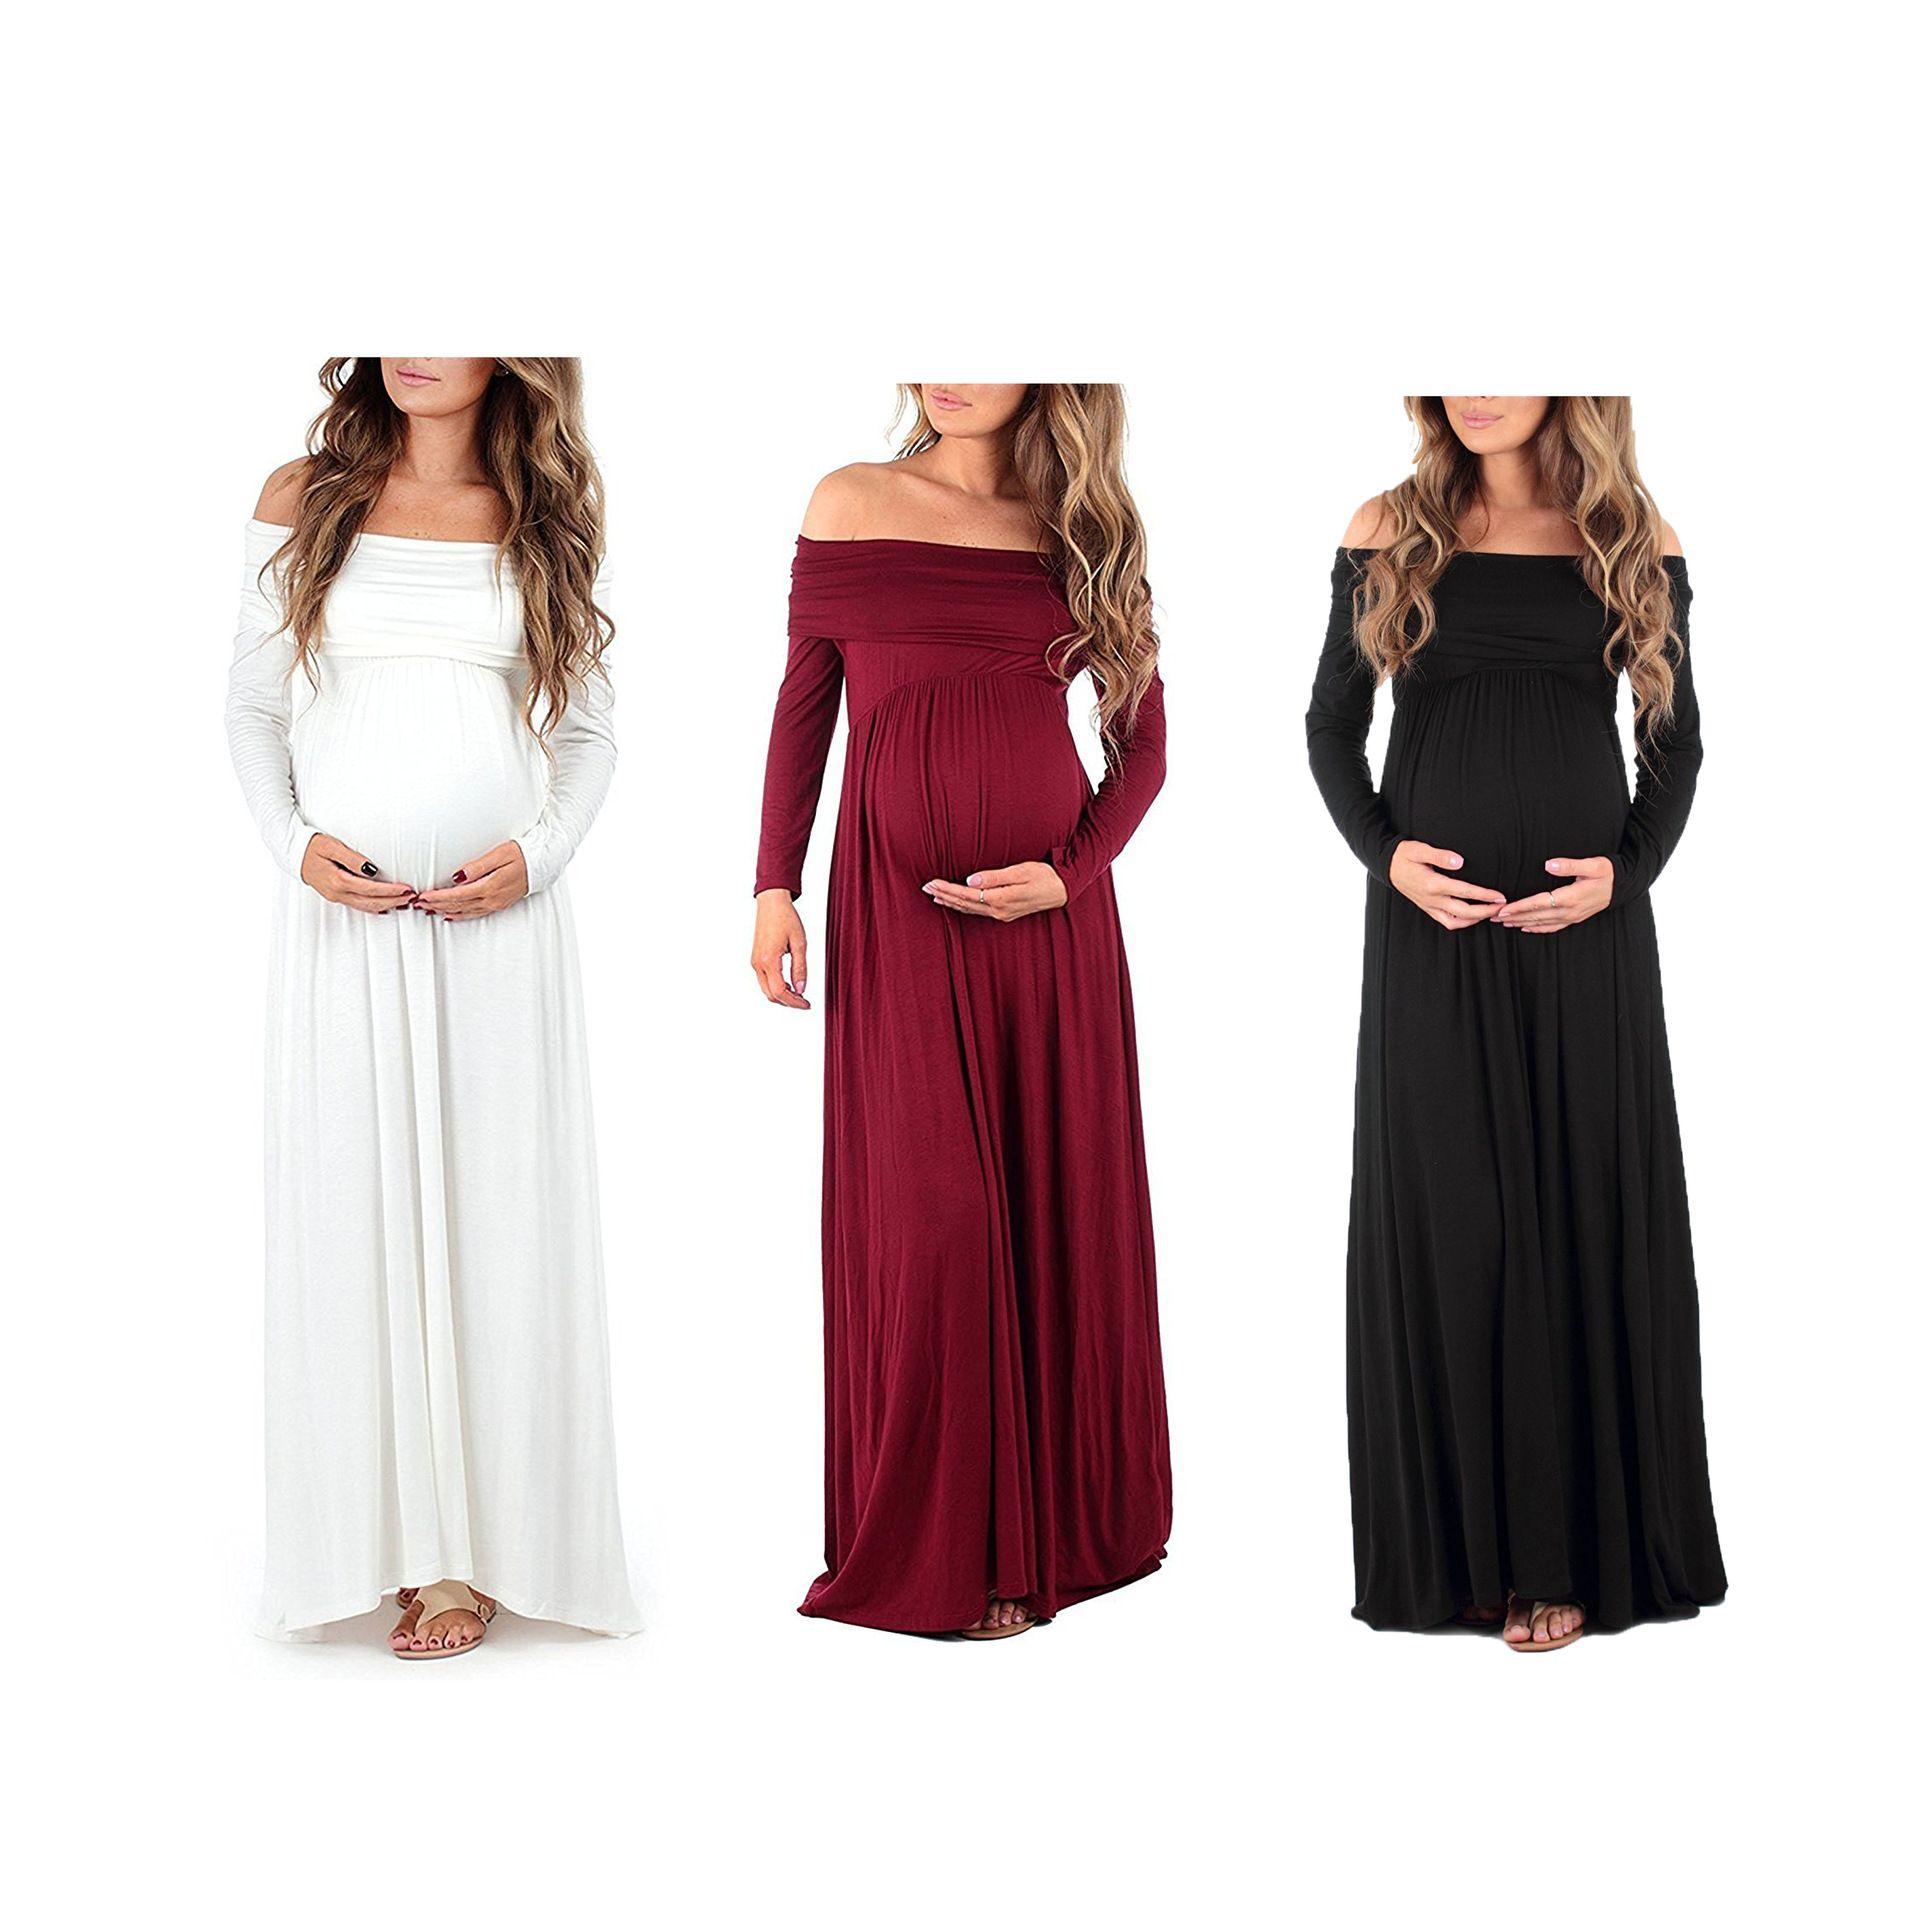 1f28d92b342bc 2019 Maternity Dress Women Cowl Neck Pregnants Photography Props Off  Shoulders Nursing Dress Drop Shipping Pregnant Women Dresses From  Mother_kidsstore, ...